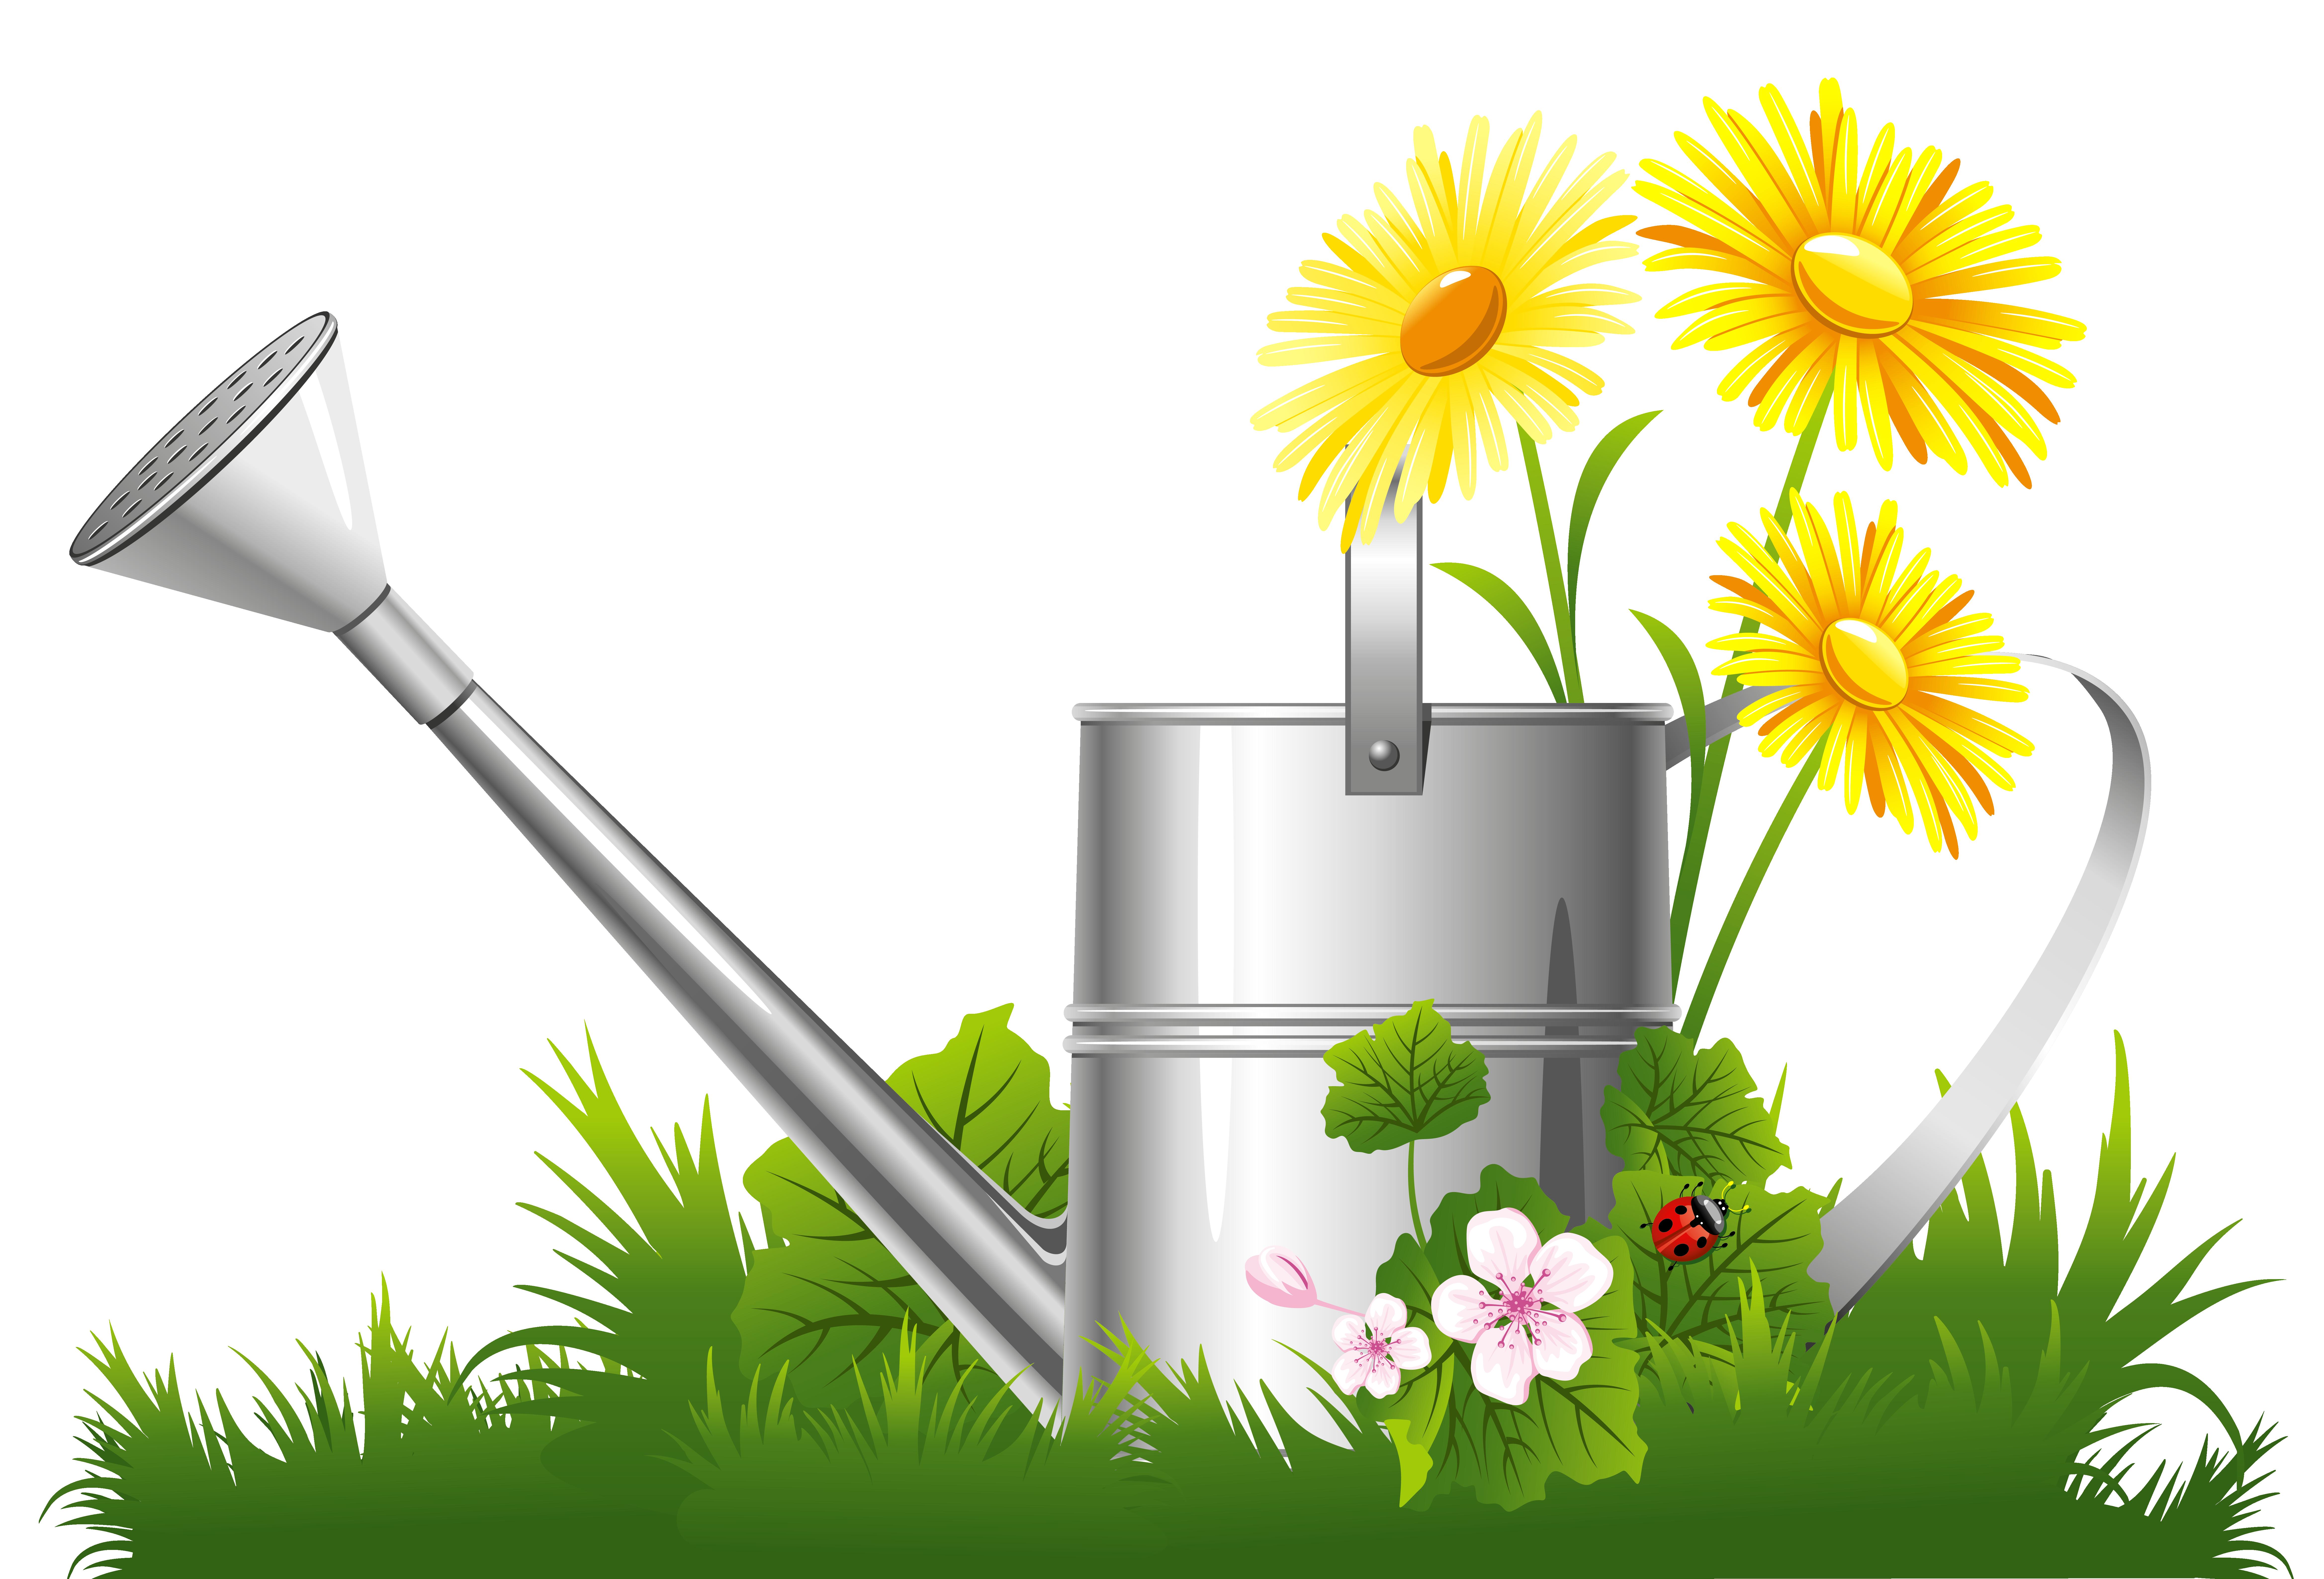 Garden clipart watering can. Flower clip art spring